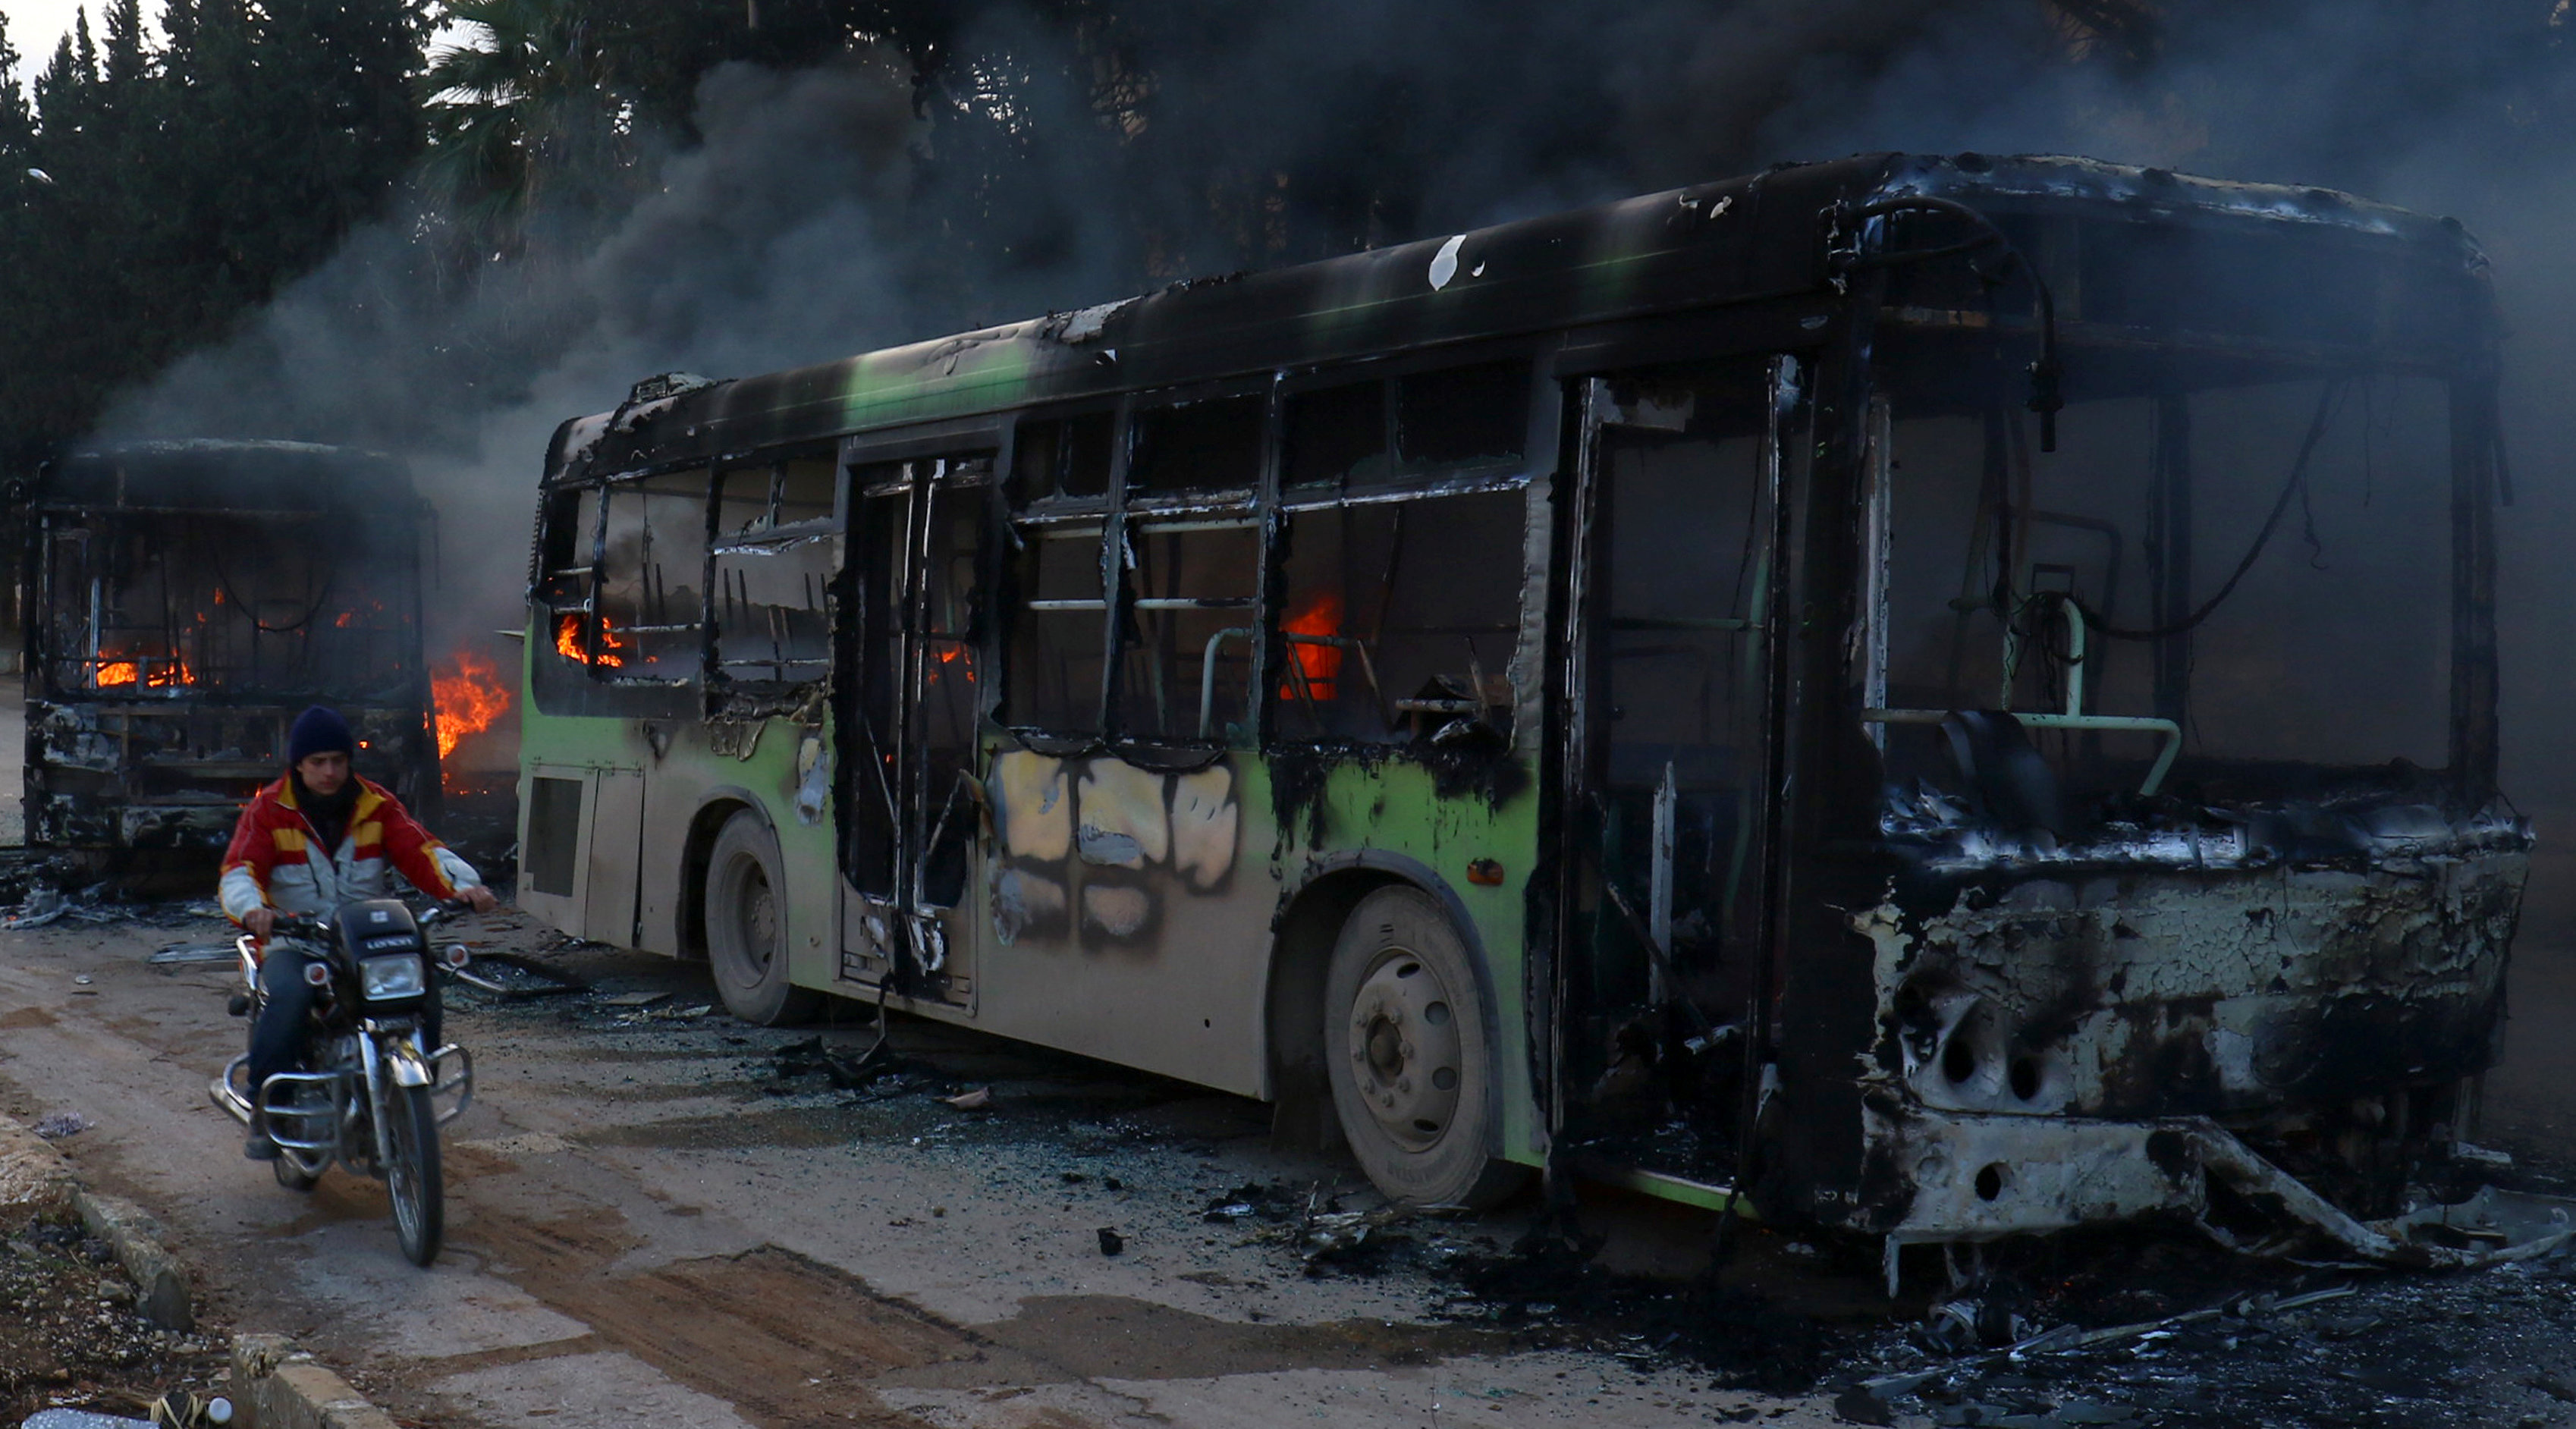 2016 12 18T142909Z 366177215 RC1F1BDC1700 RTRMADP 3 MIDEAST CRISIS SYRIA IDLIB